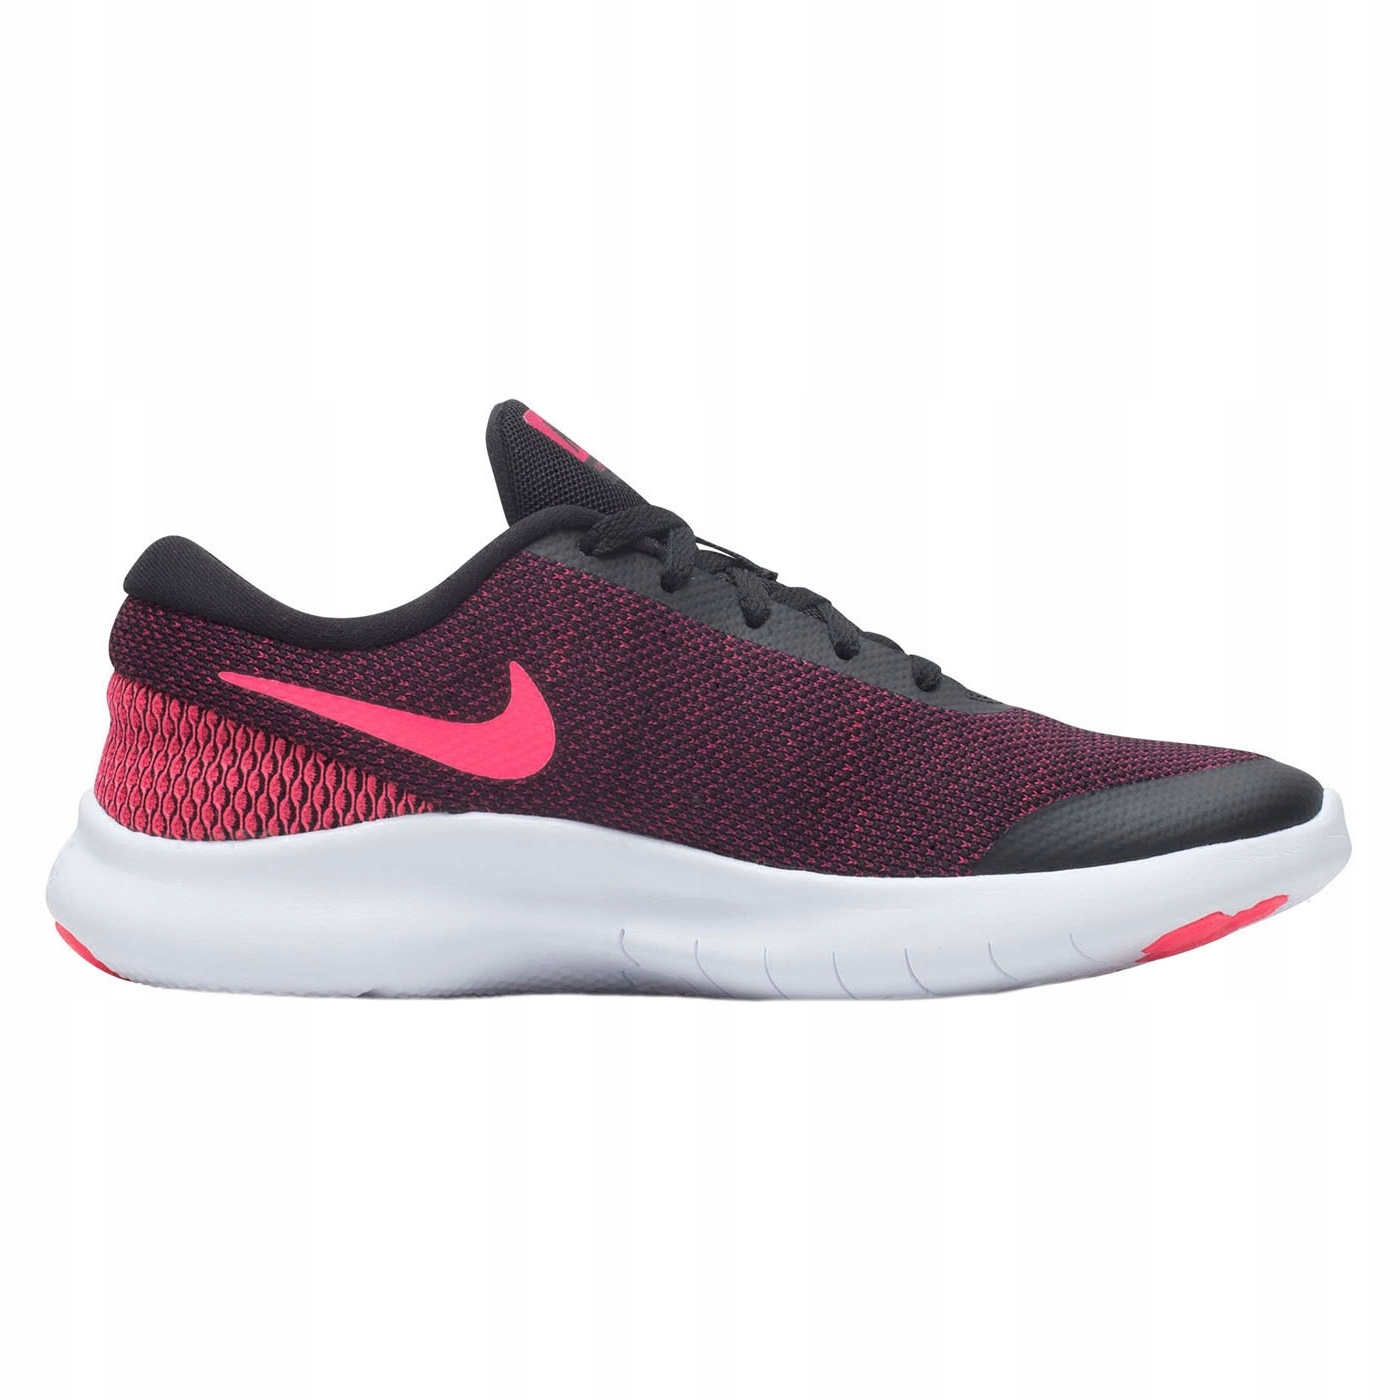 ff399b098b Nike Flex Experience RN 7 908996-006 - 7703228832 - oficjalne ...